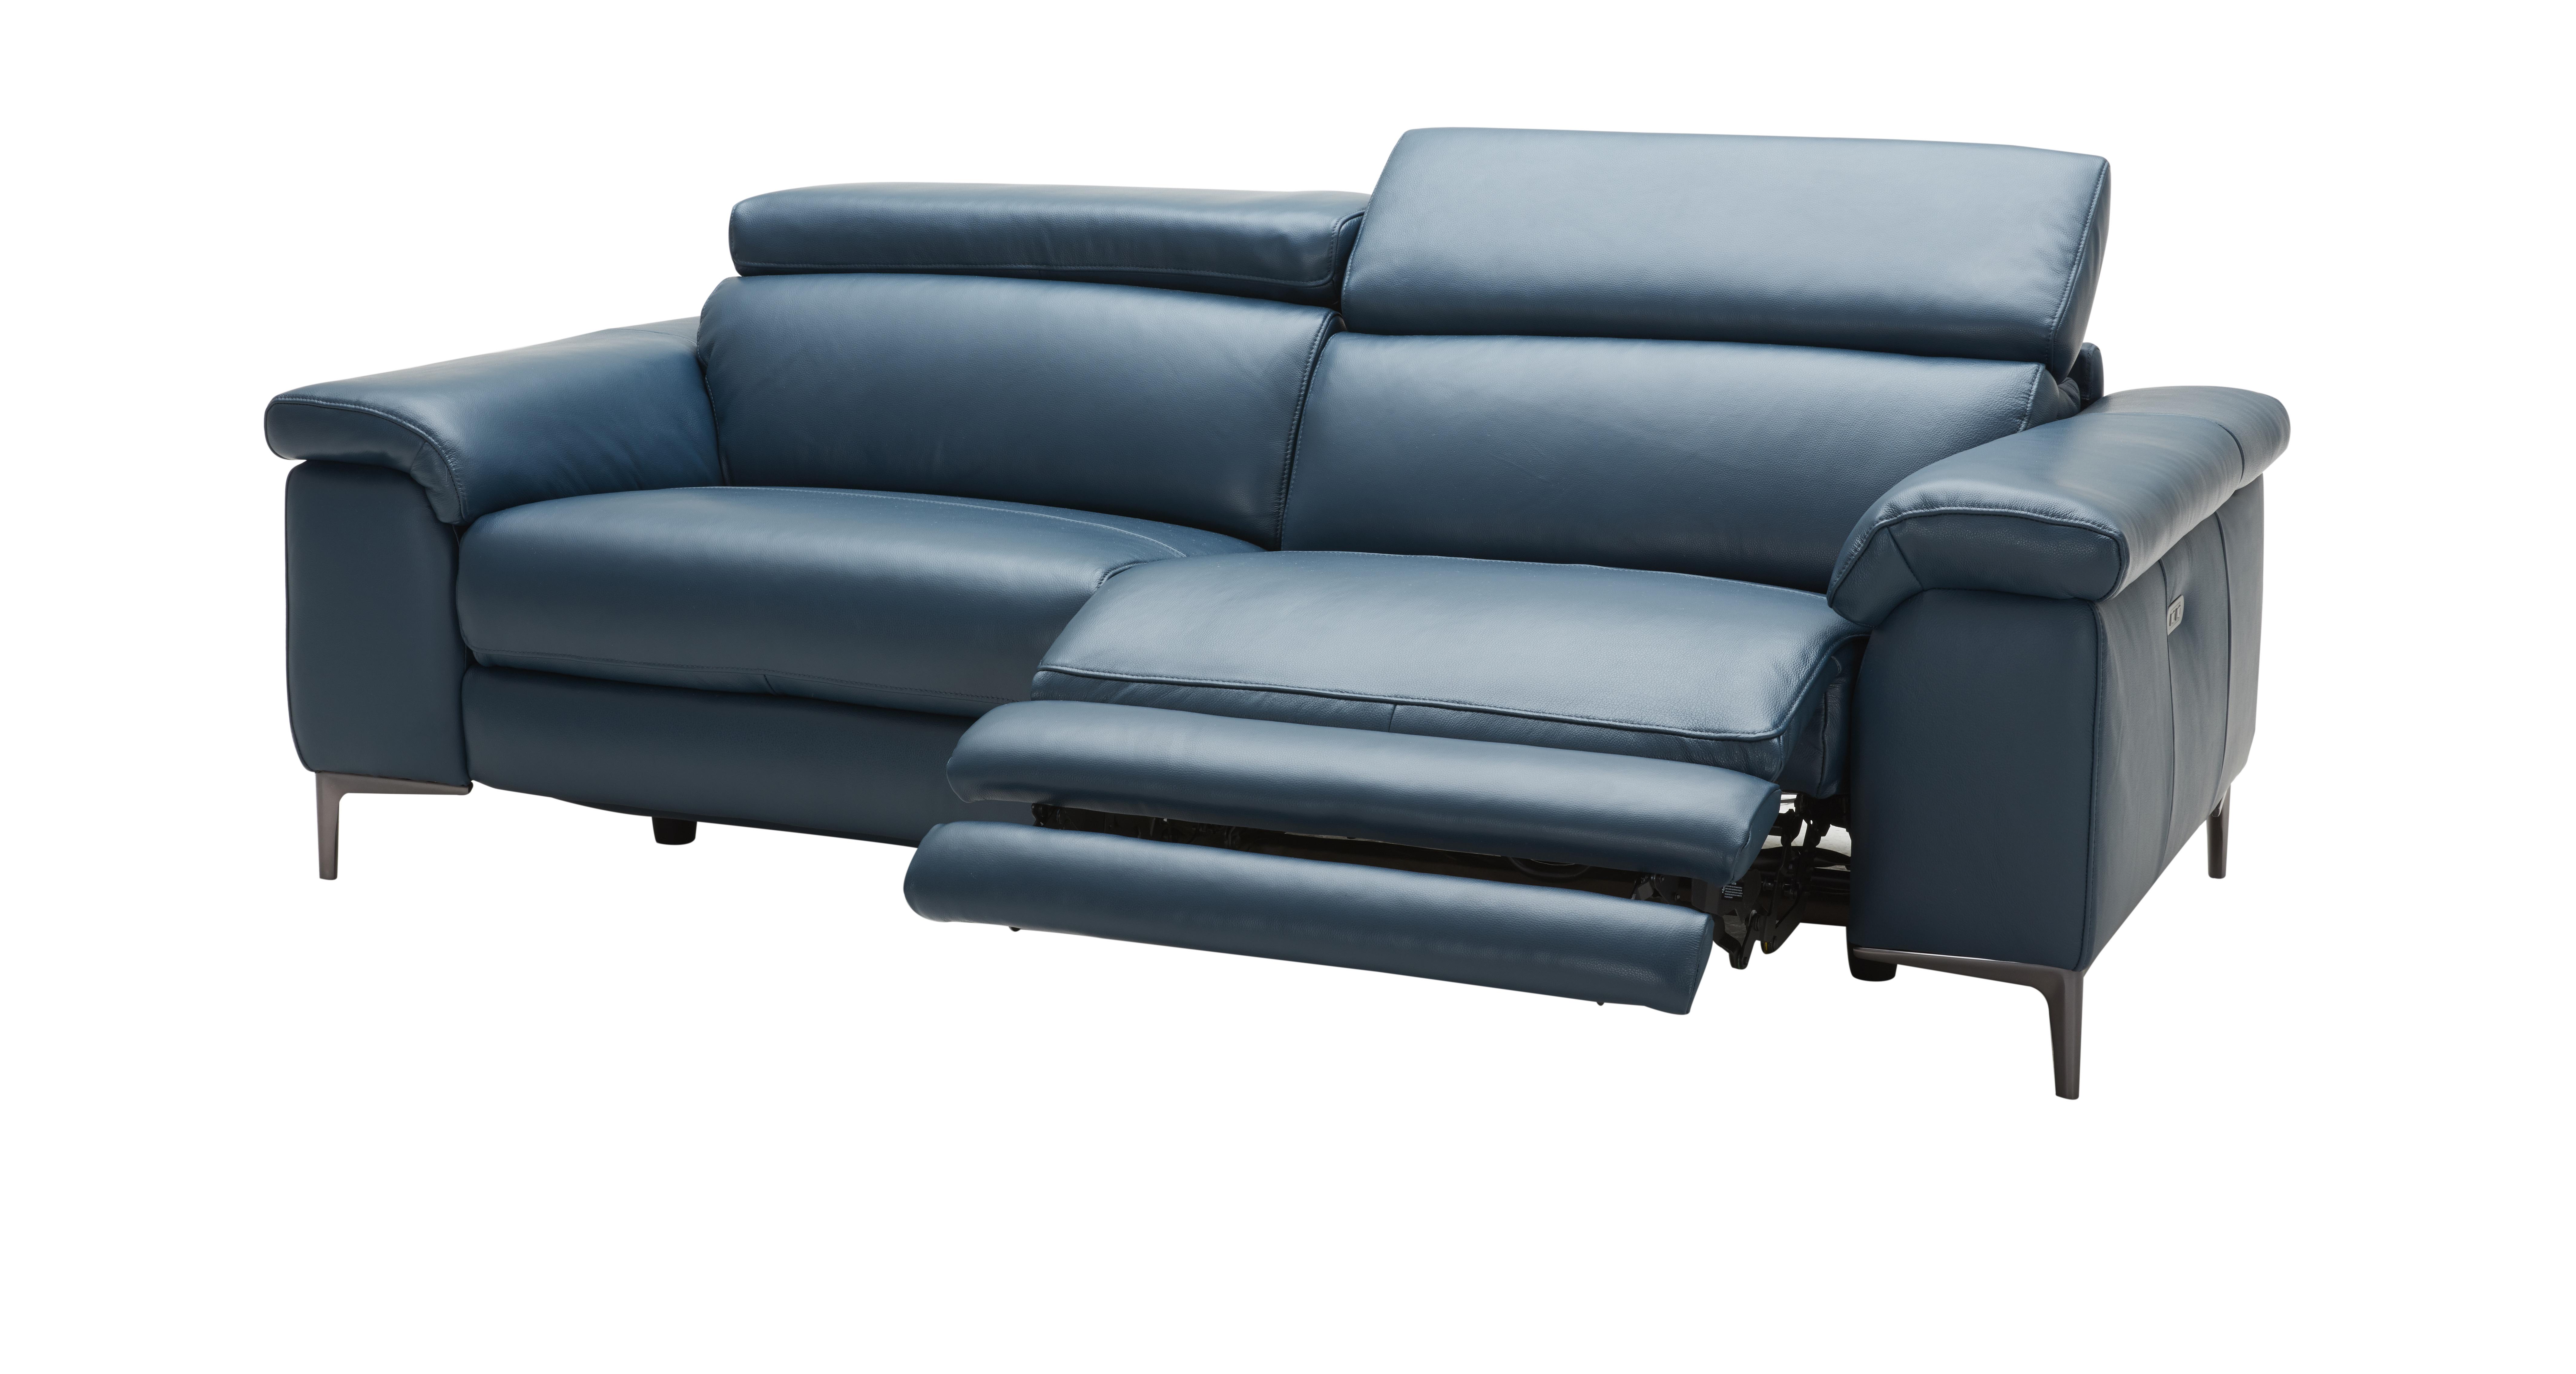 Passmore Electric 3 Seater Sofa